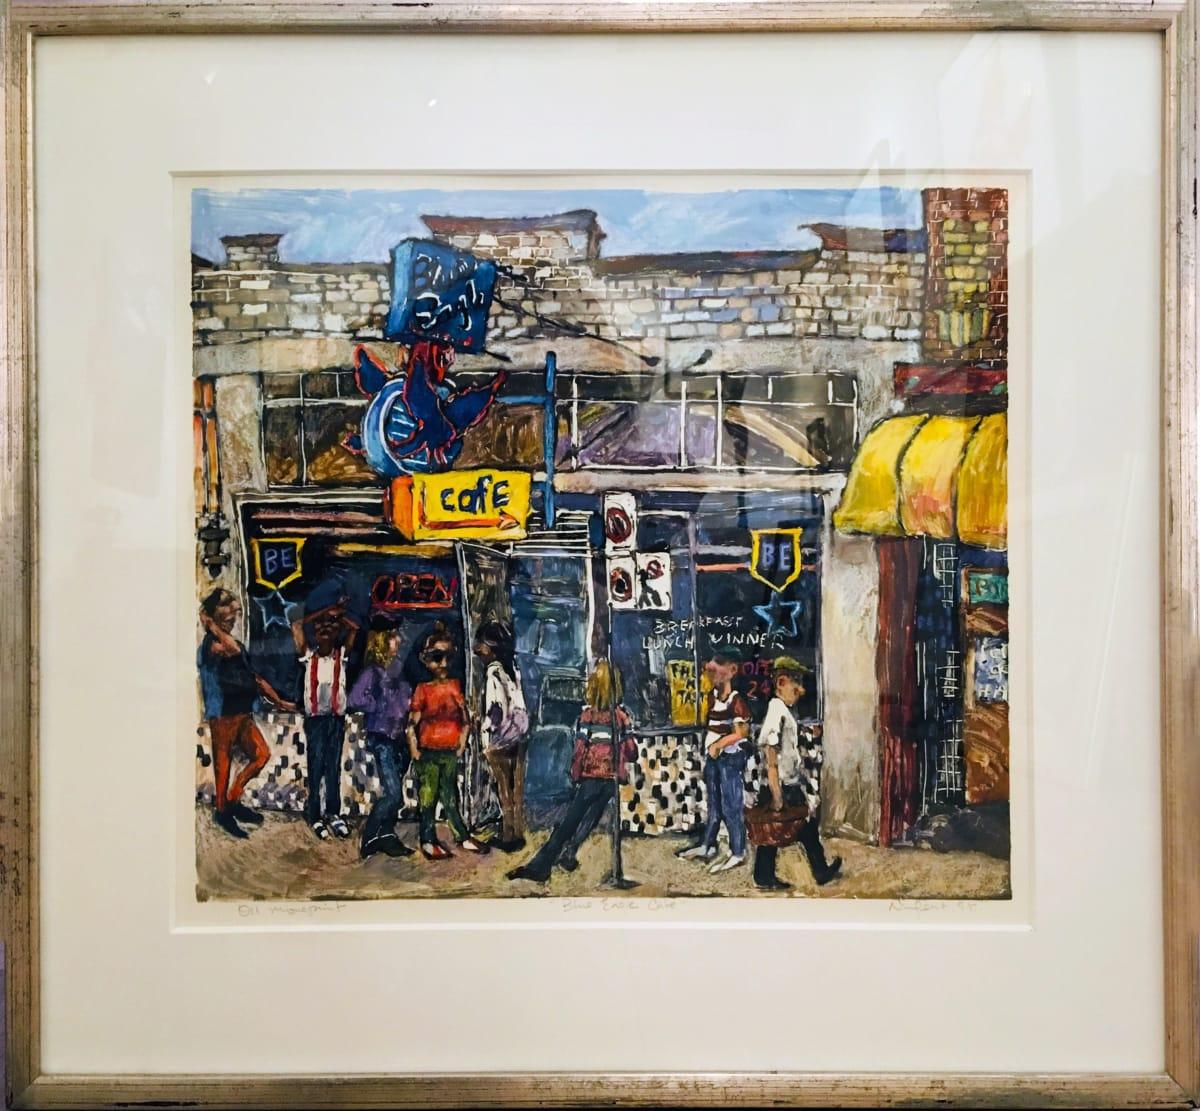 2296 - Blue Eagle Cafe by Cynthia Nugent